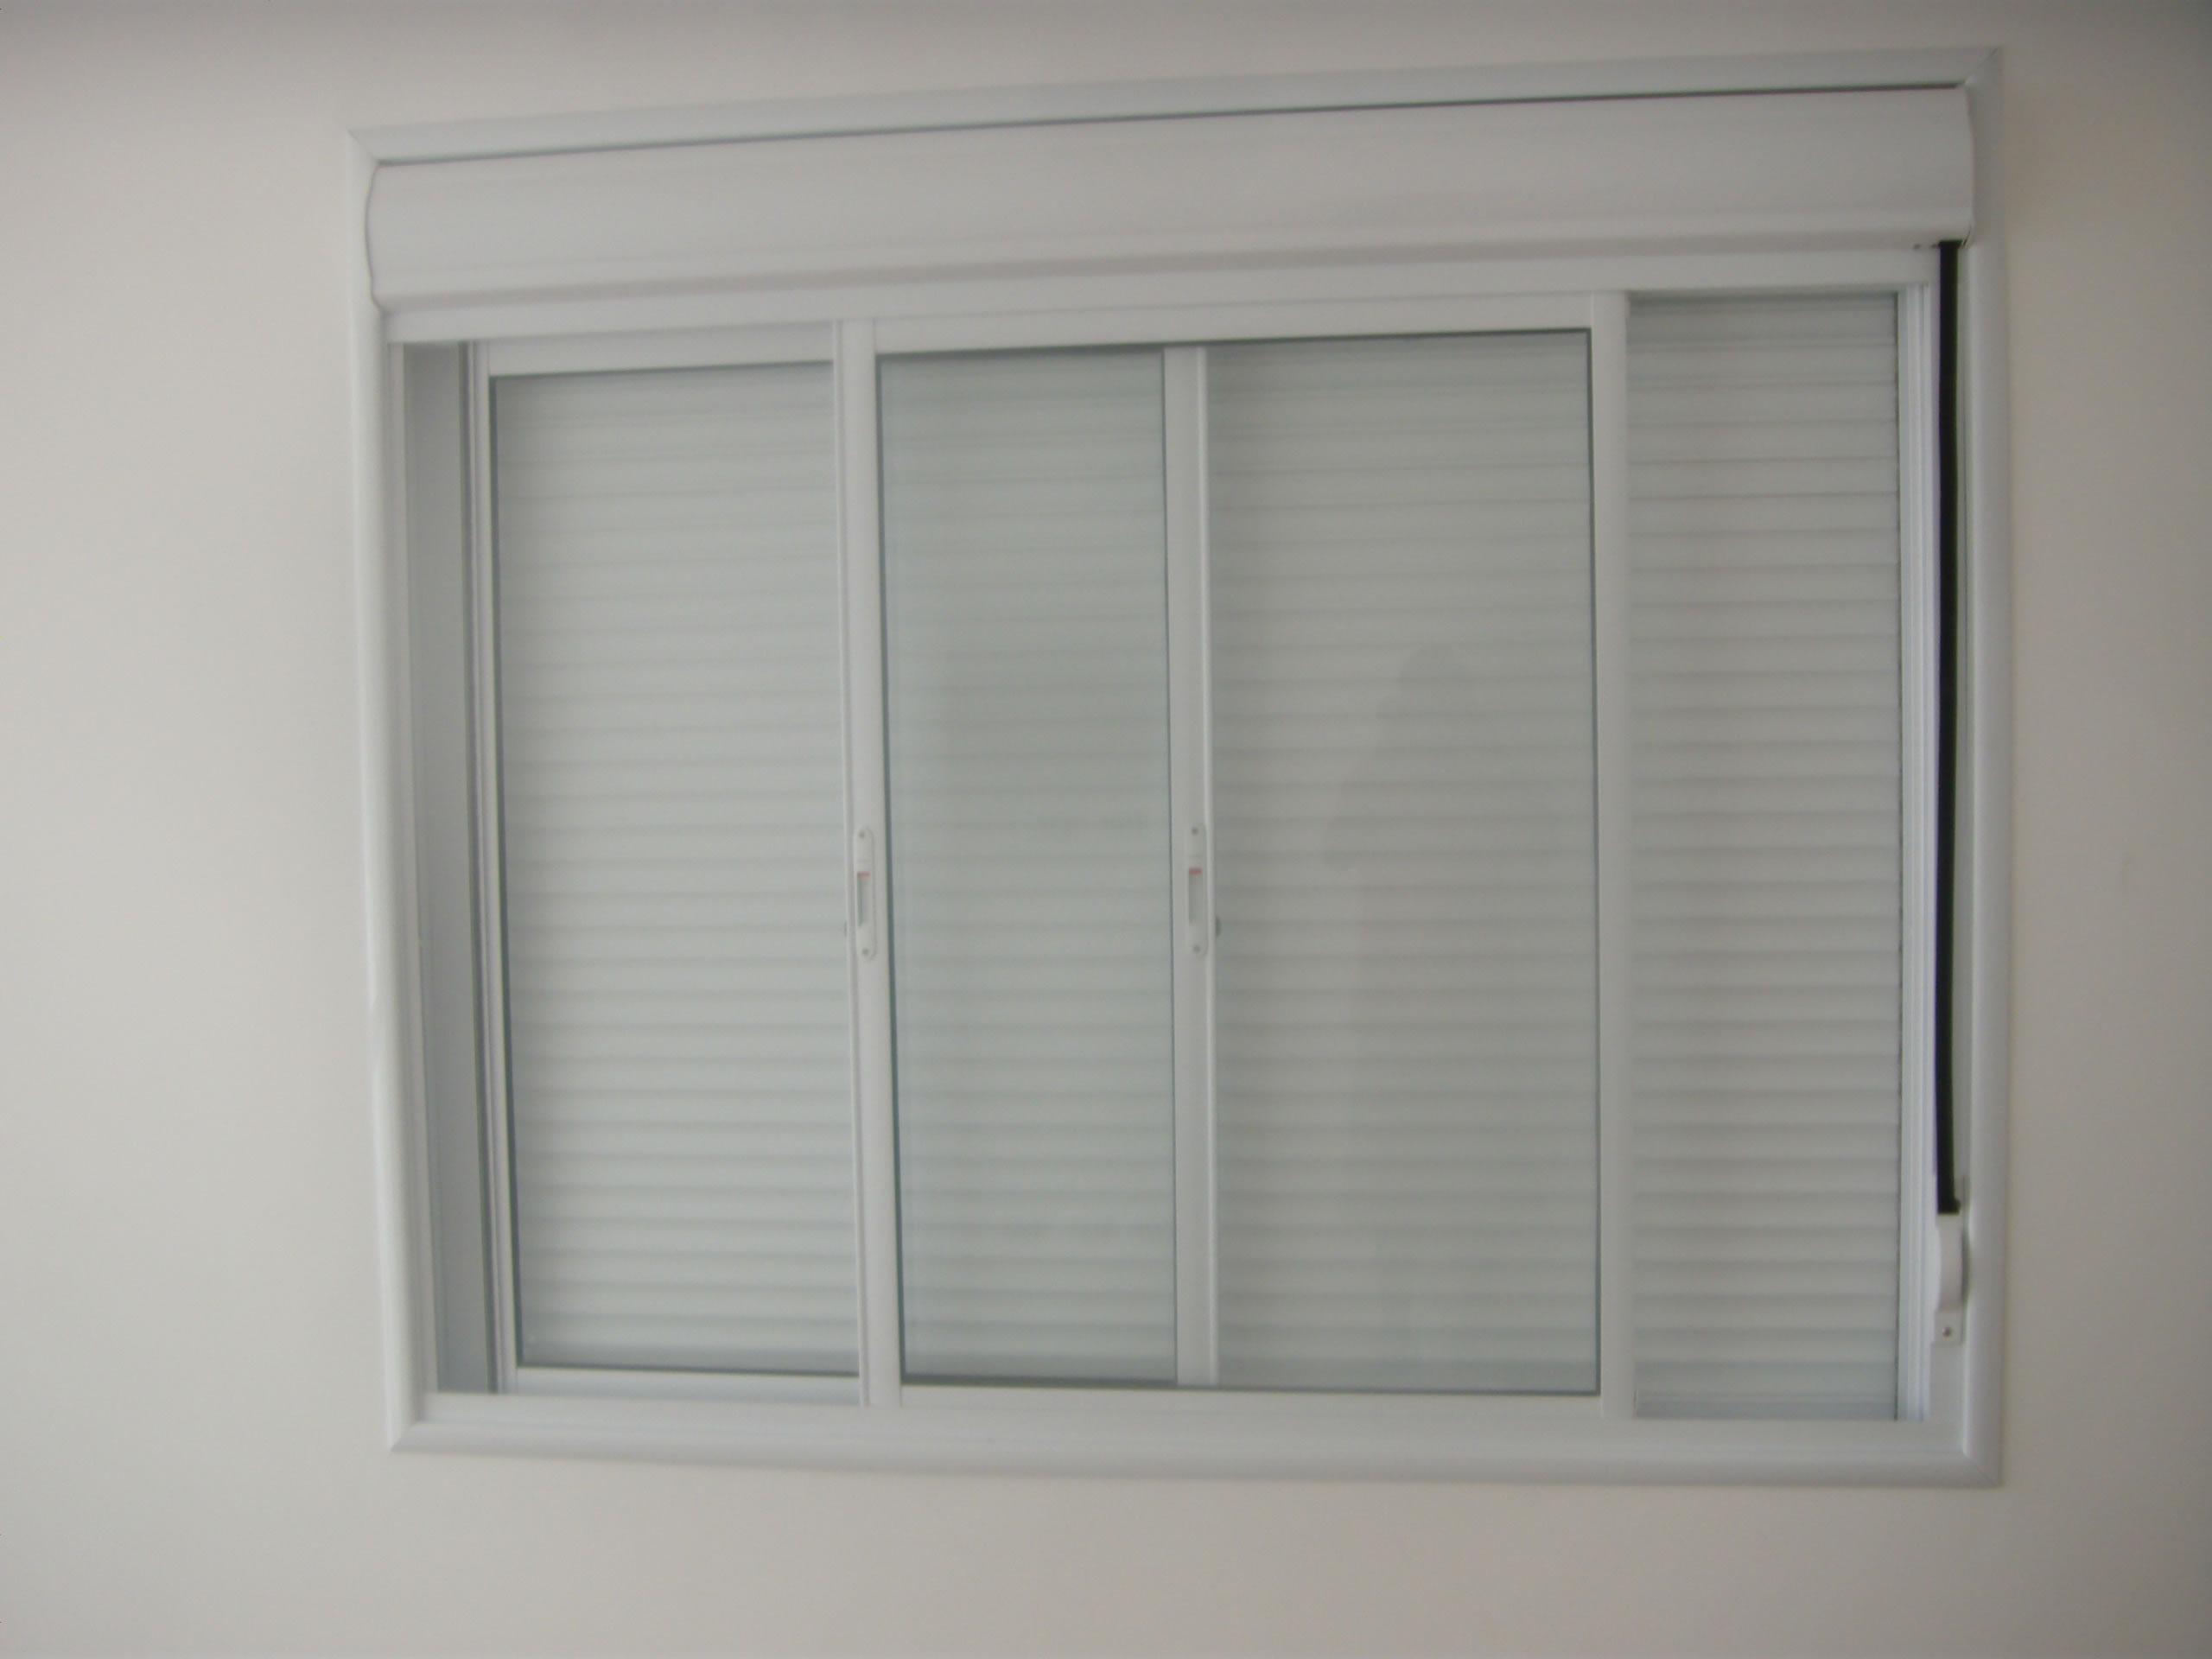 #535749 Klarit: Vidros Esquadrias de Alumínio Guarda Corpos Box Espelhos  1326 Preço De Janelas De Aluminio Em Juiz De Fora